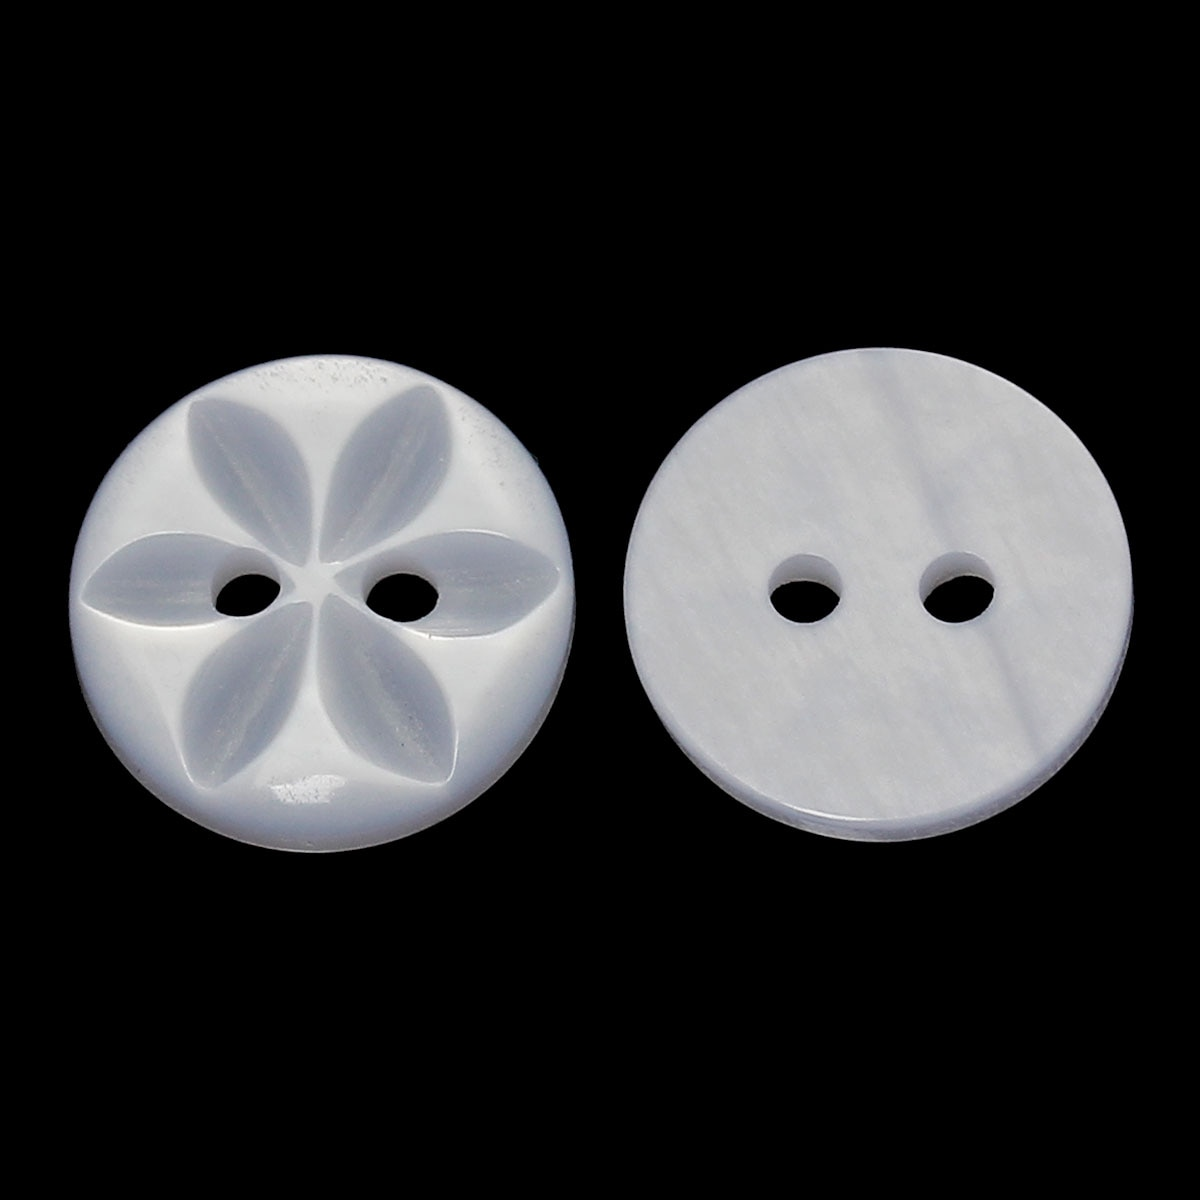 "DoreenBeads Botón de costura de resina Scrapbooking redondo blanco 2 agujeros patrón de flores 14,0mm (4/8 "") Dia, 8 Uds"